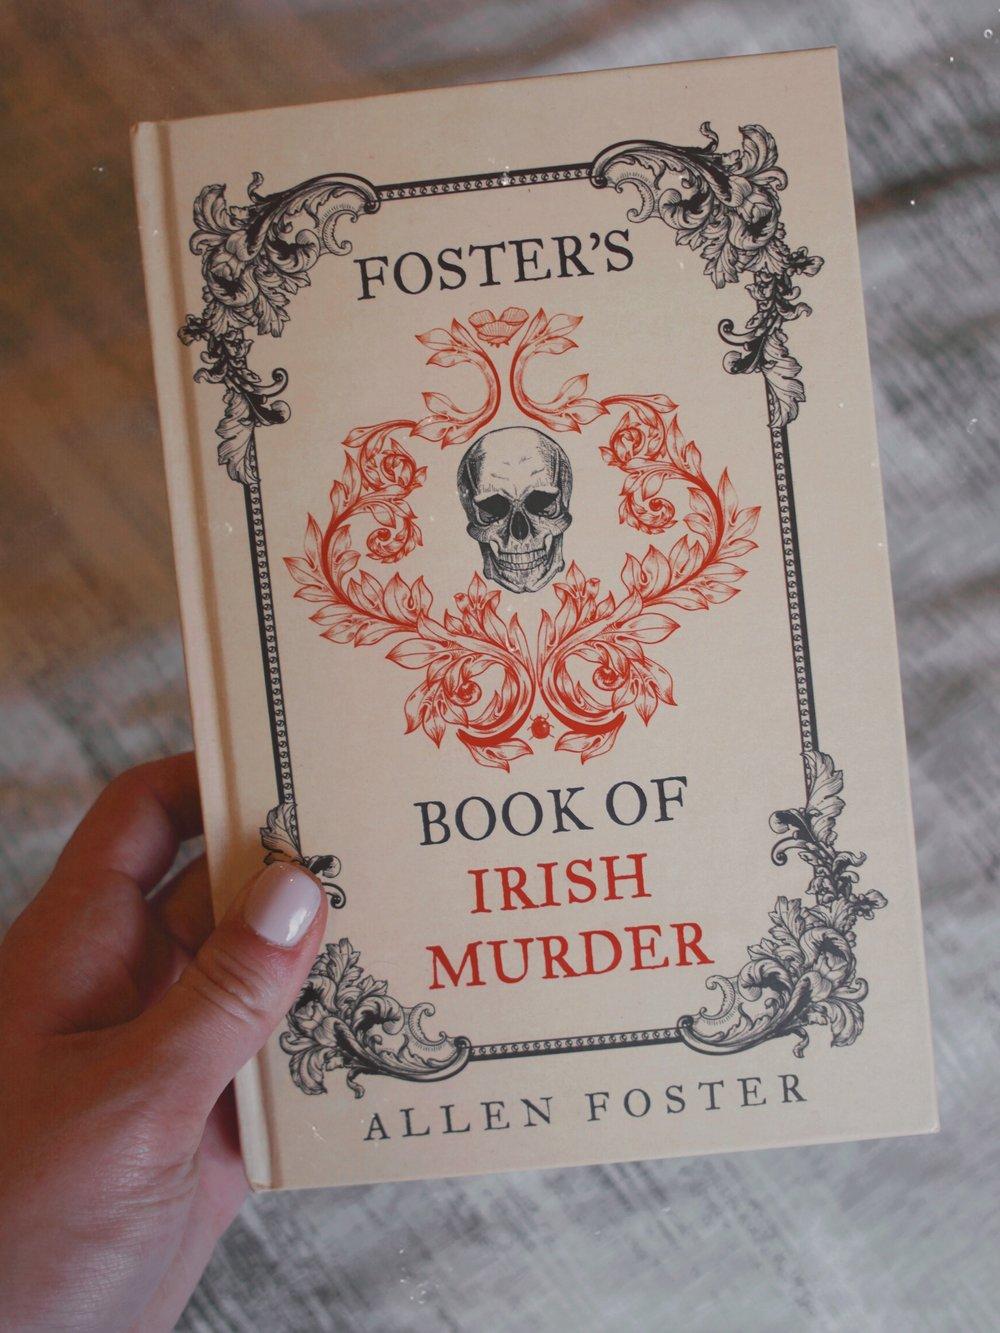 Foster's Book of Irish Murder